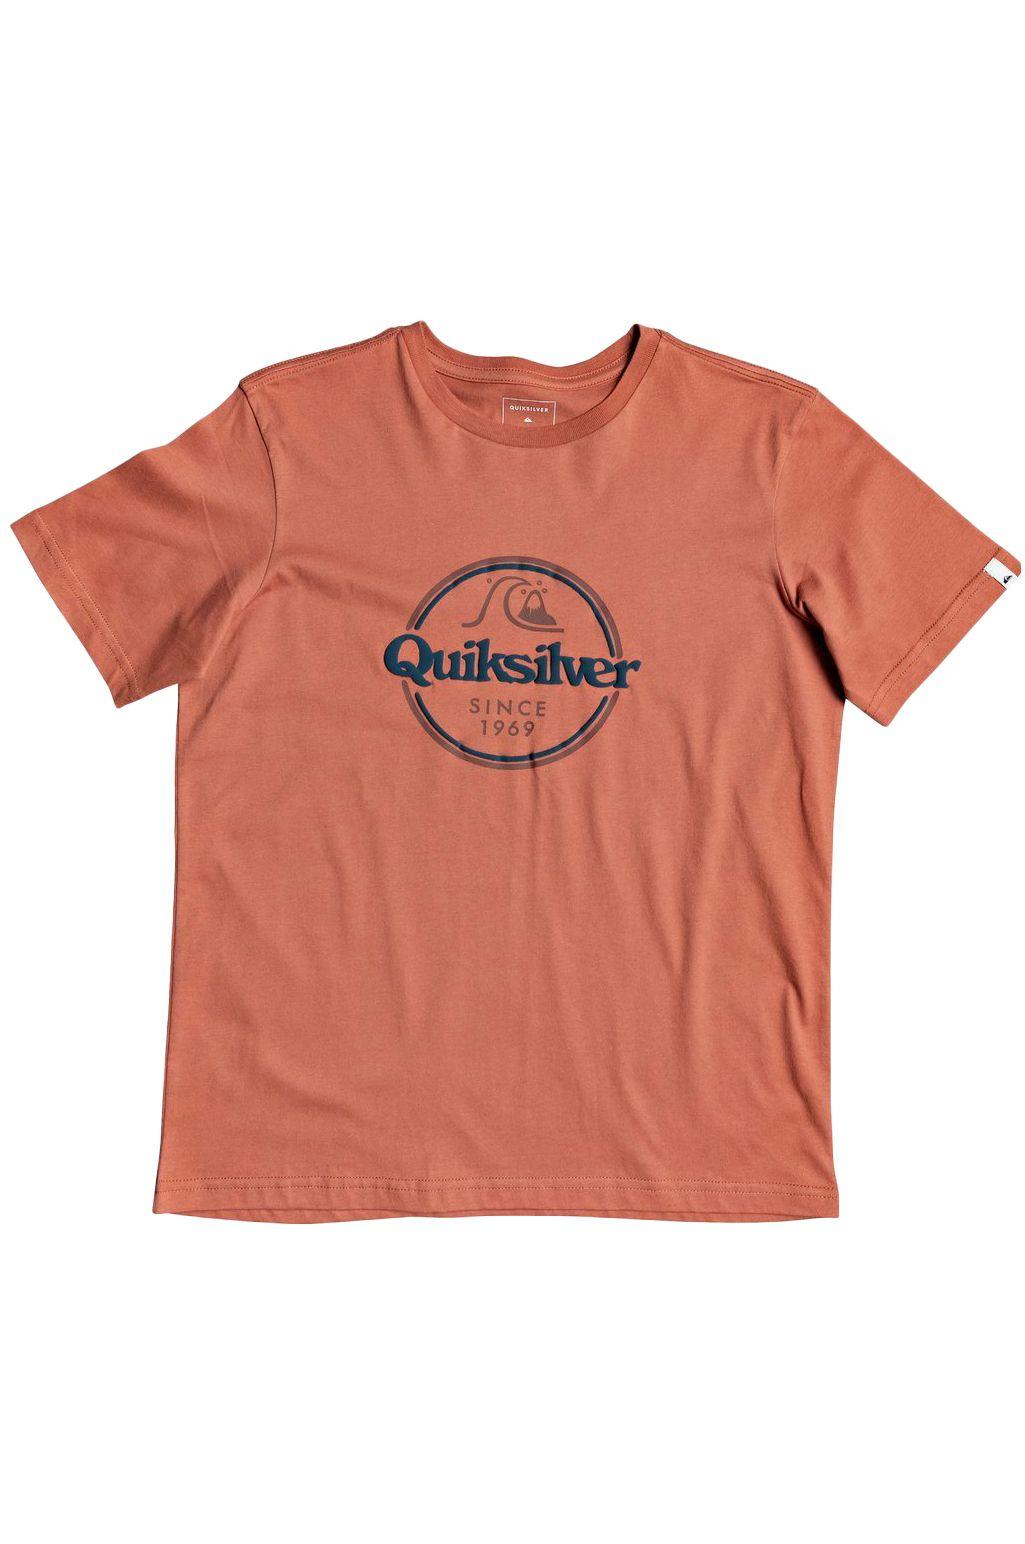 Quiksilver T-Shirt WORDS REMAIN Redwood